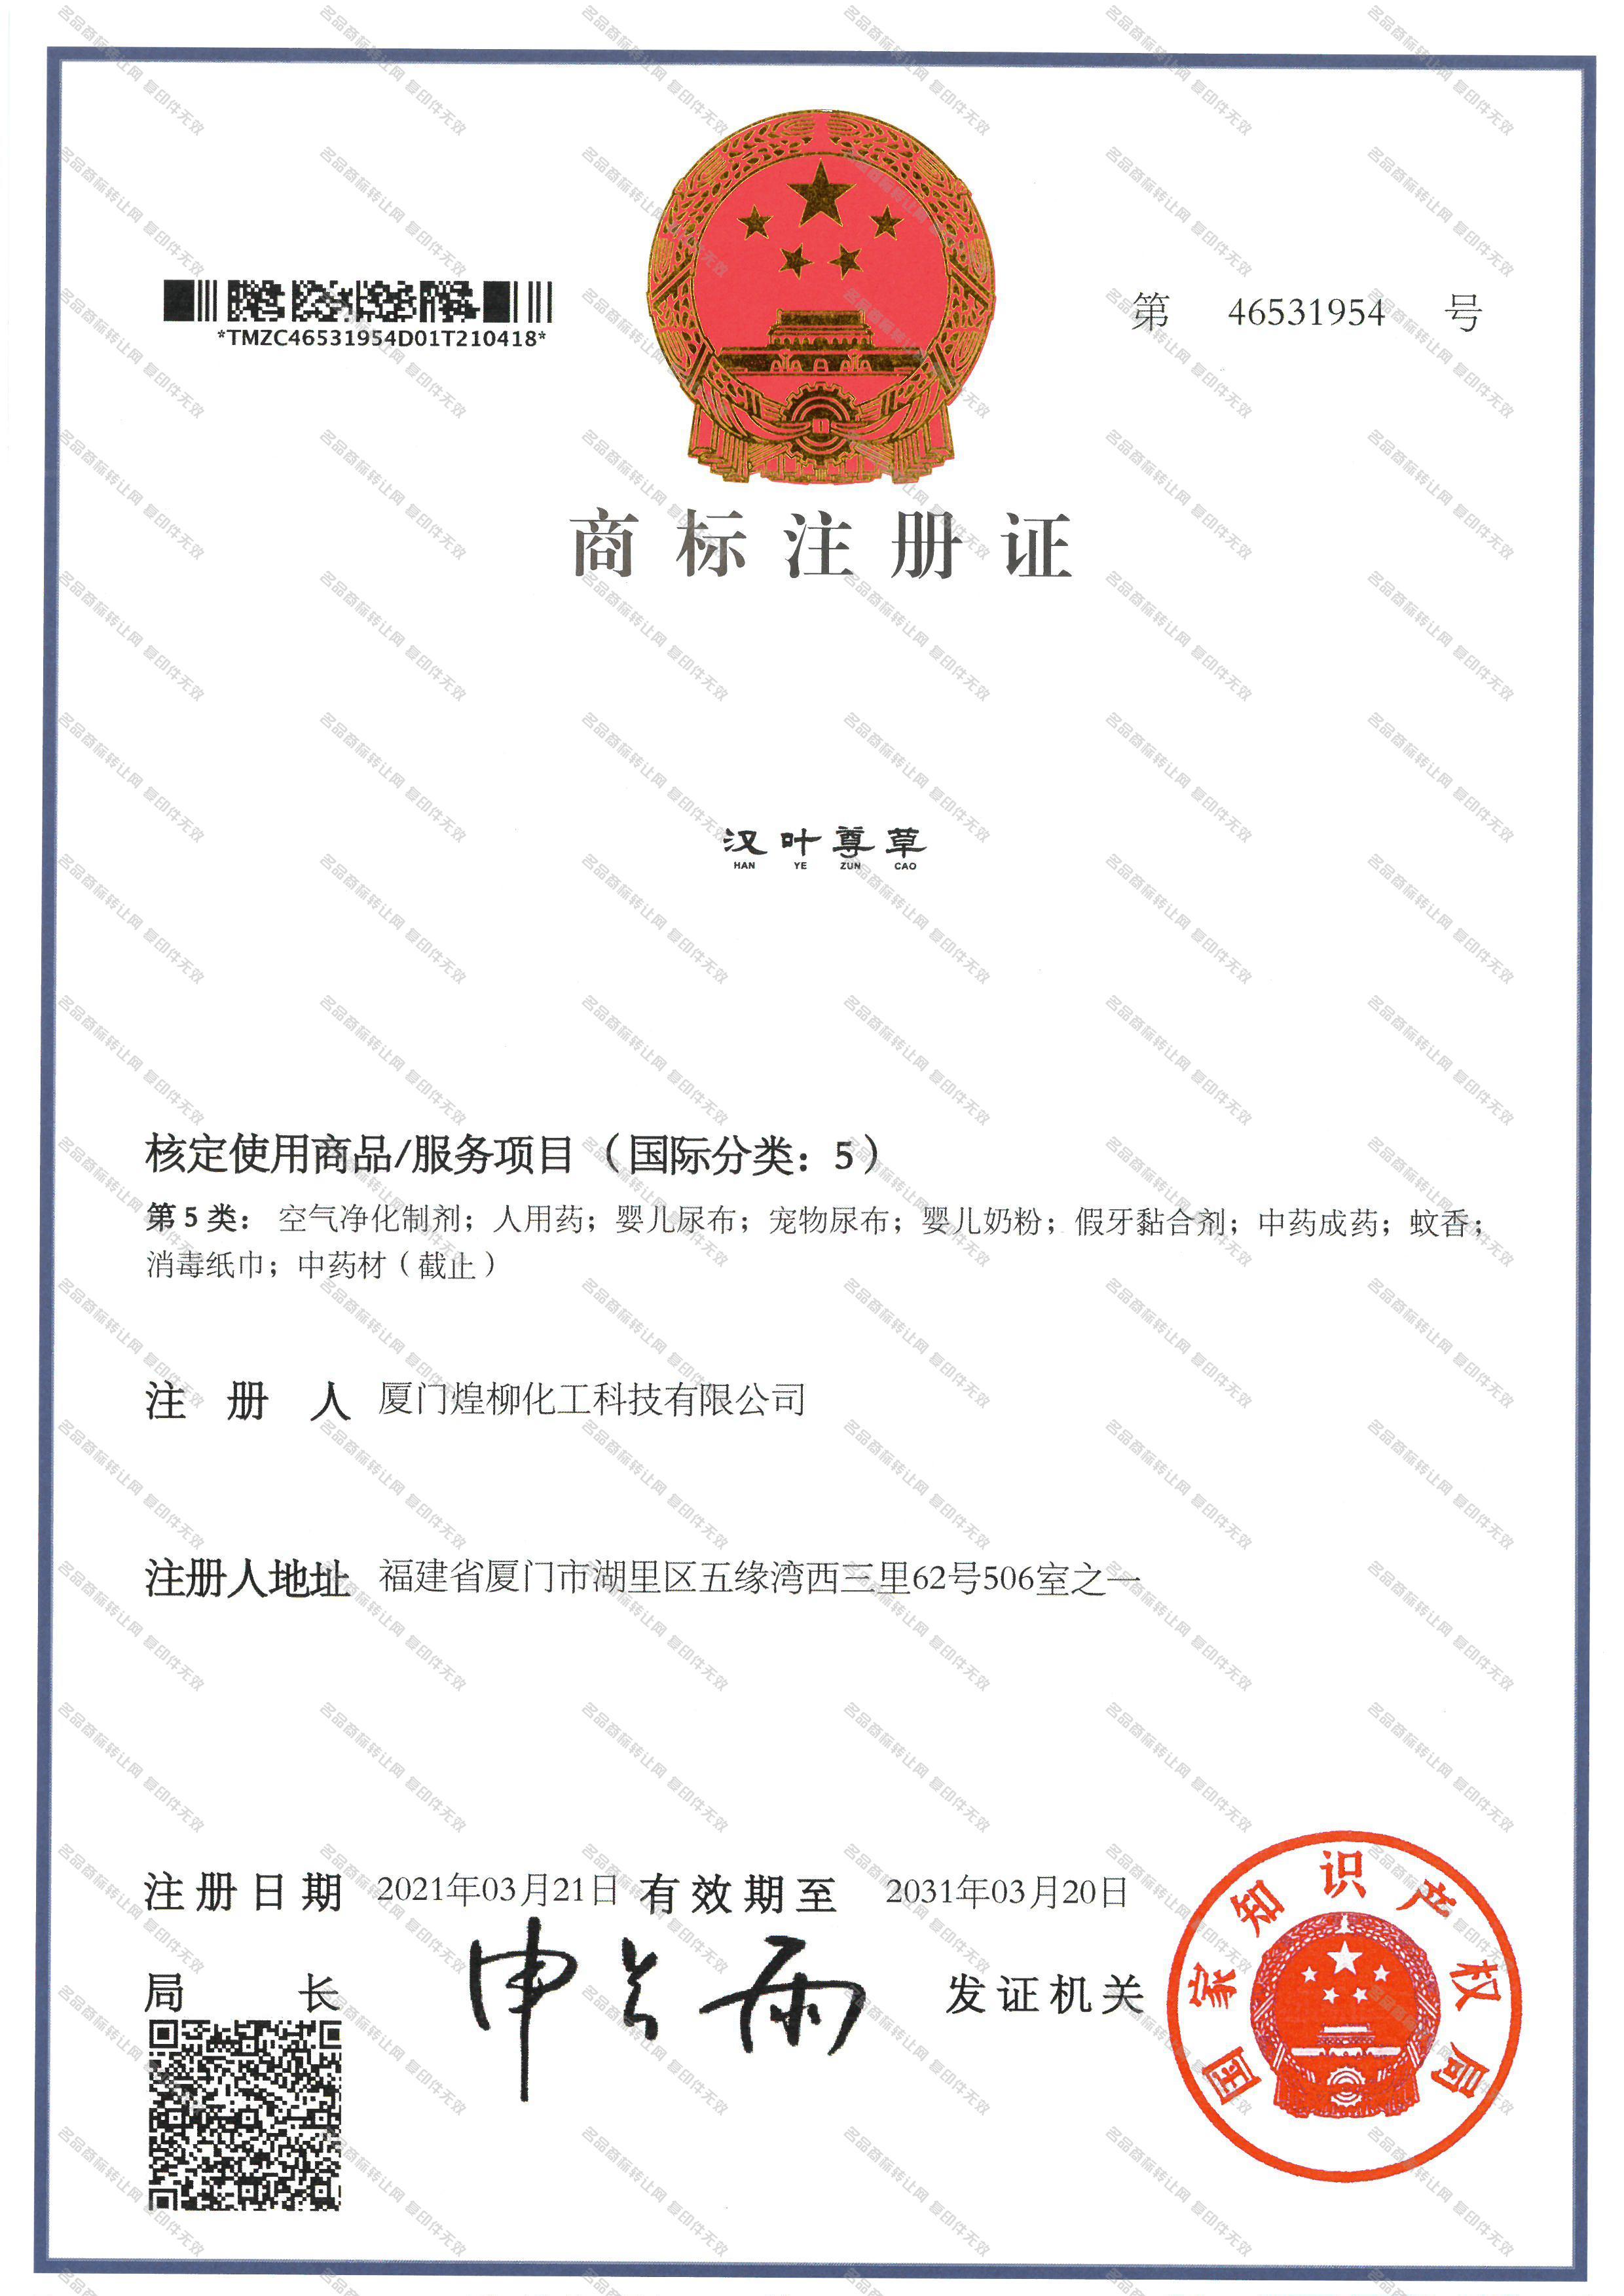 汉叶尊草;HANYEZUNCAO注册证